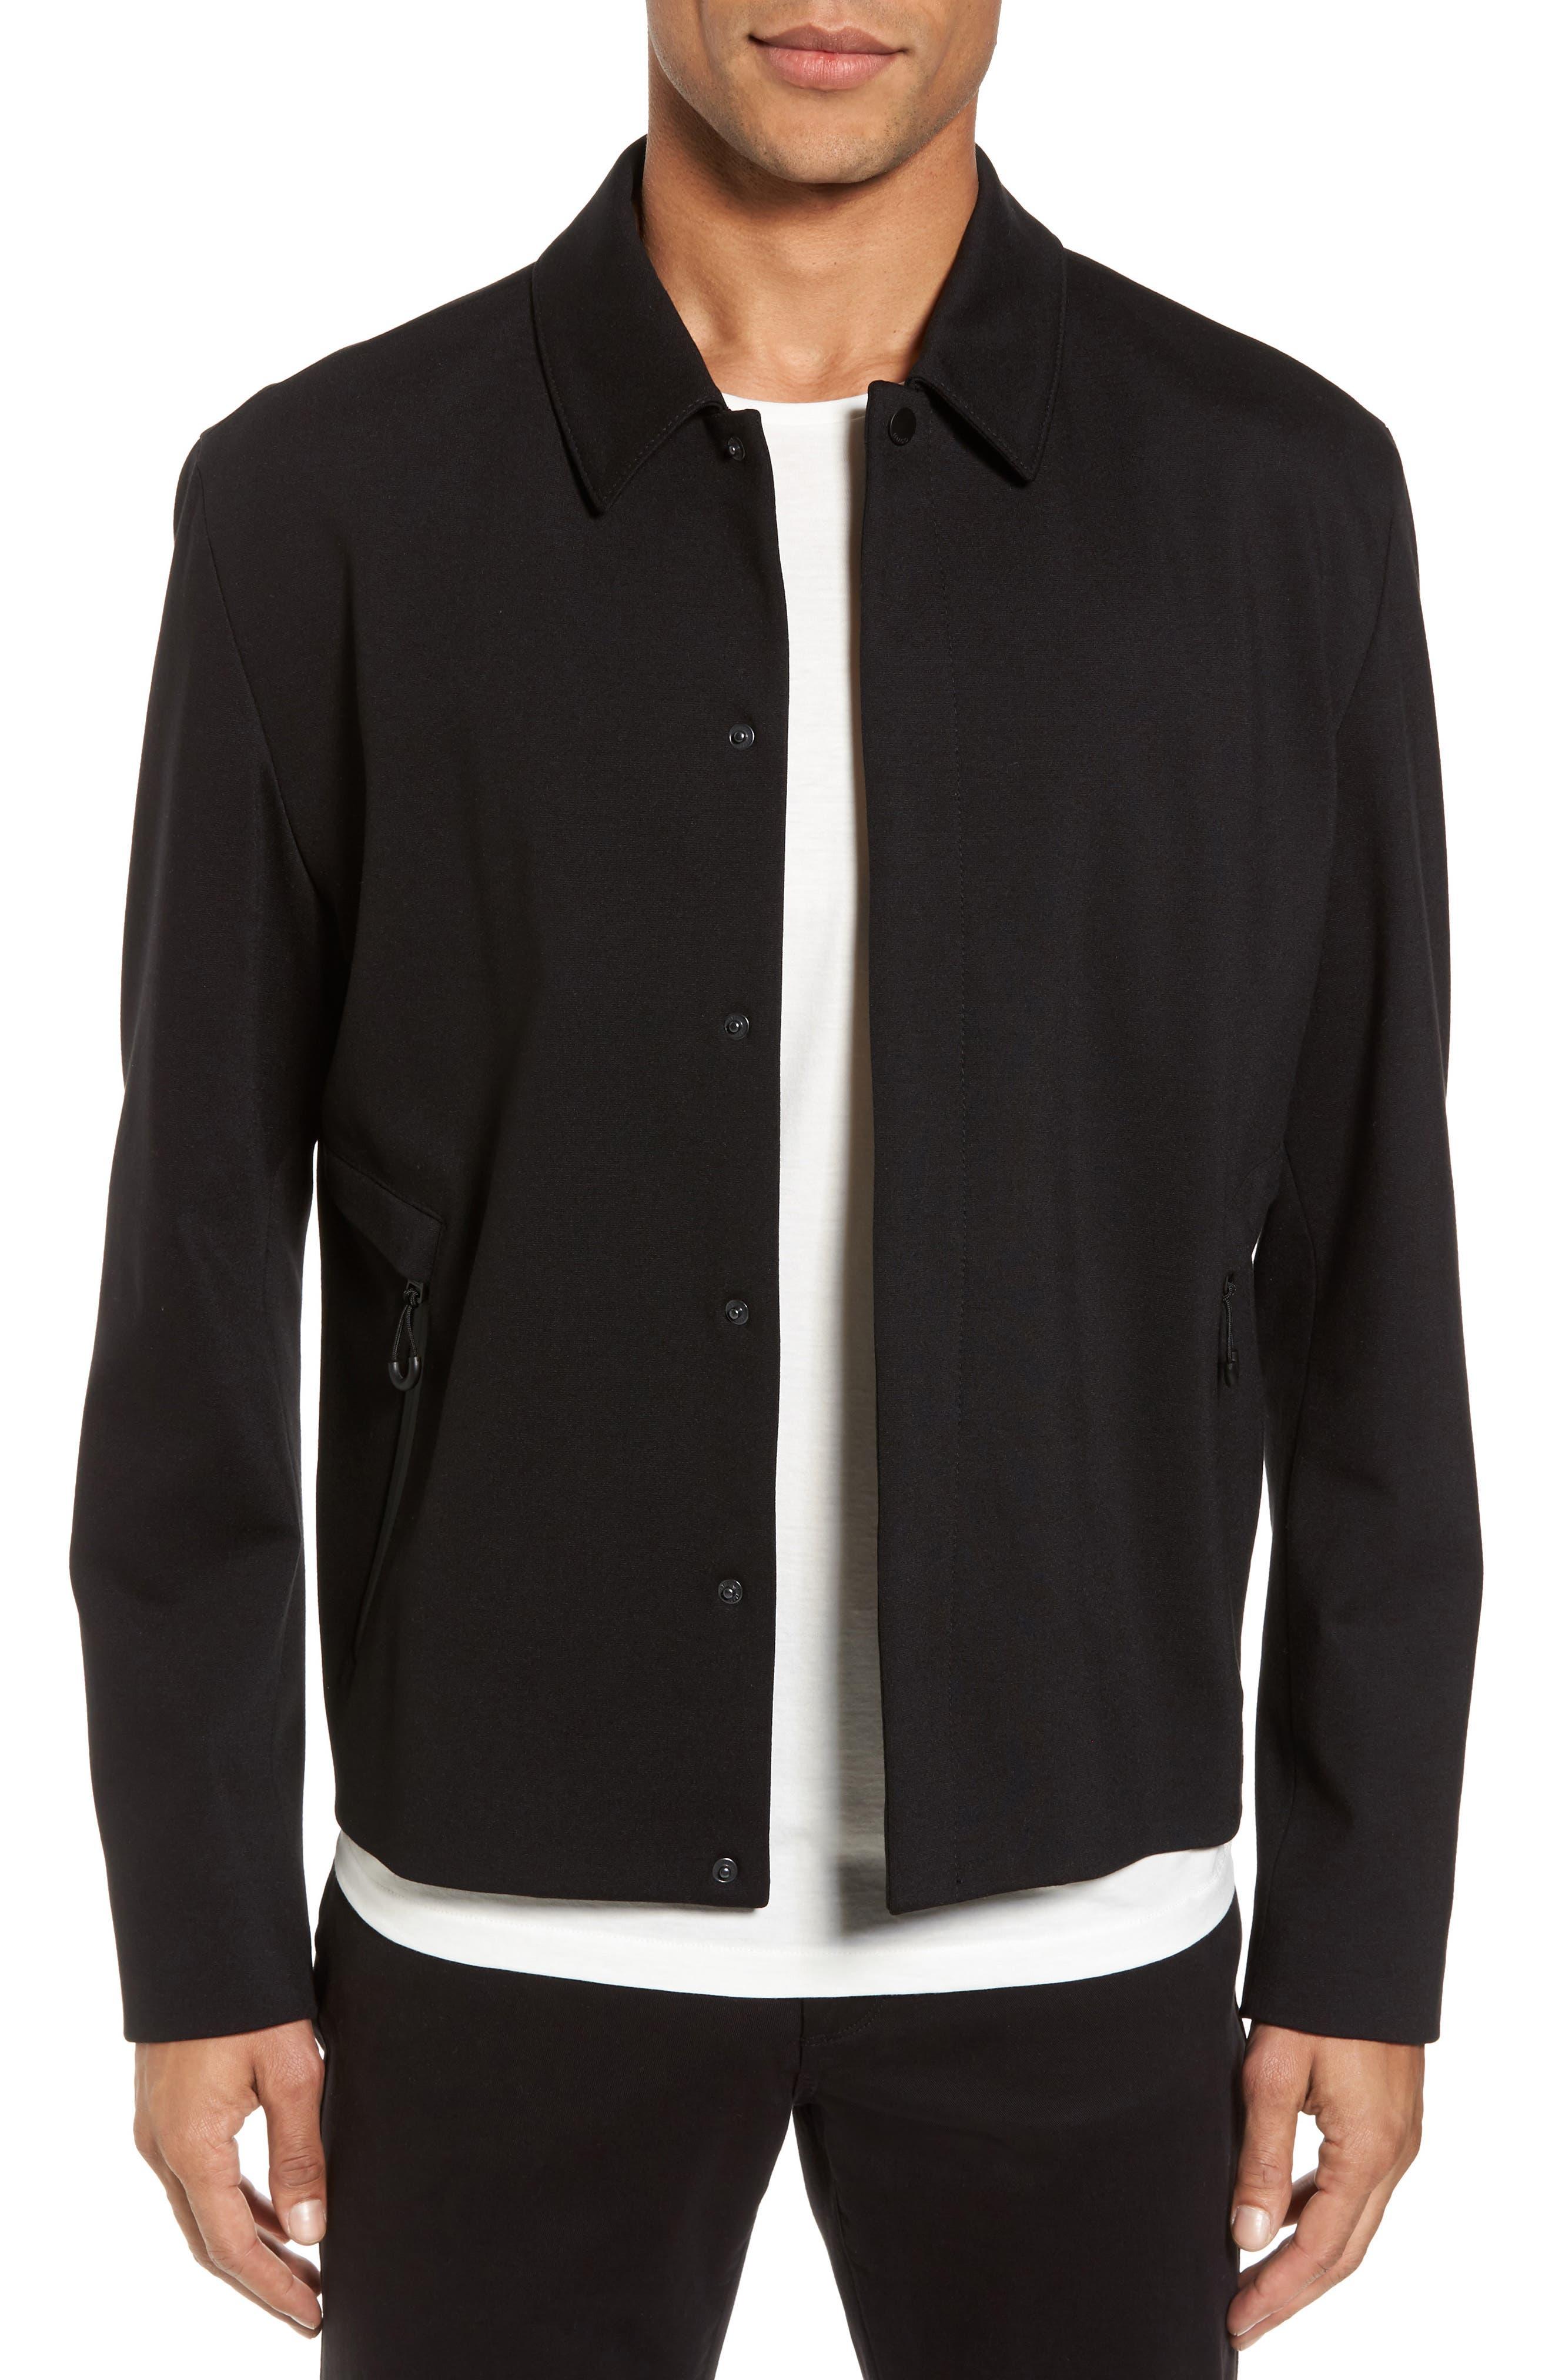 Hugo Boss Babenu Shirt Jacket,                             Main thumbnail 1, color,